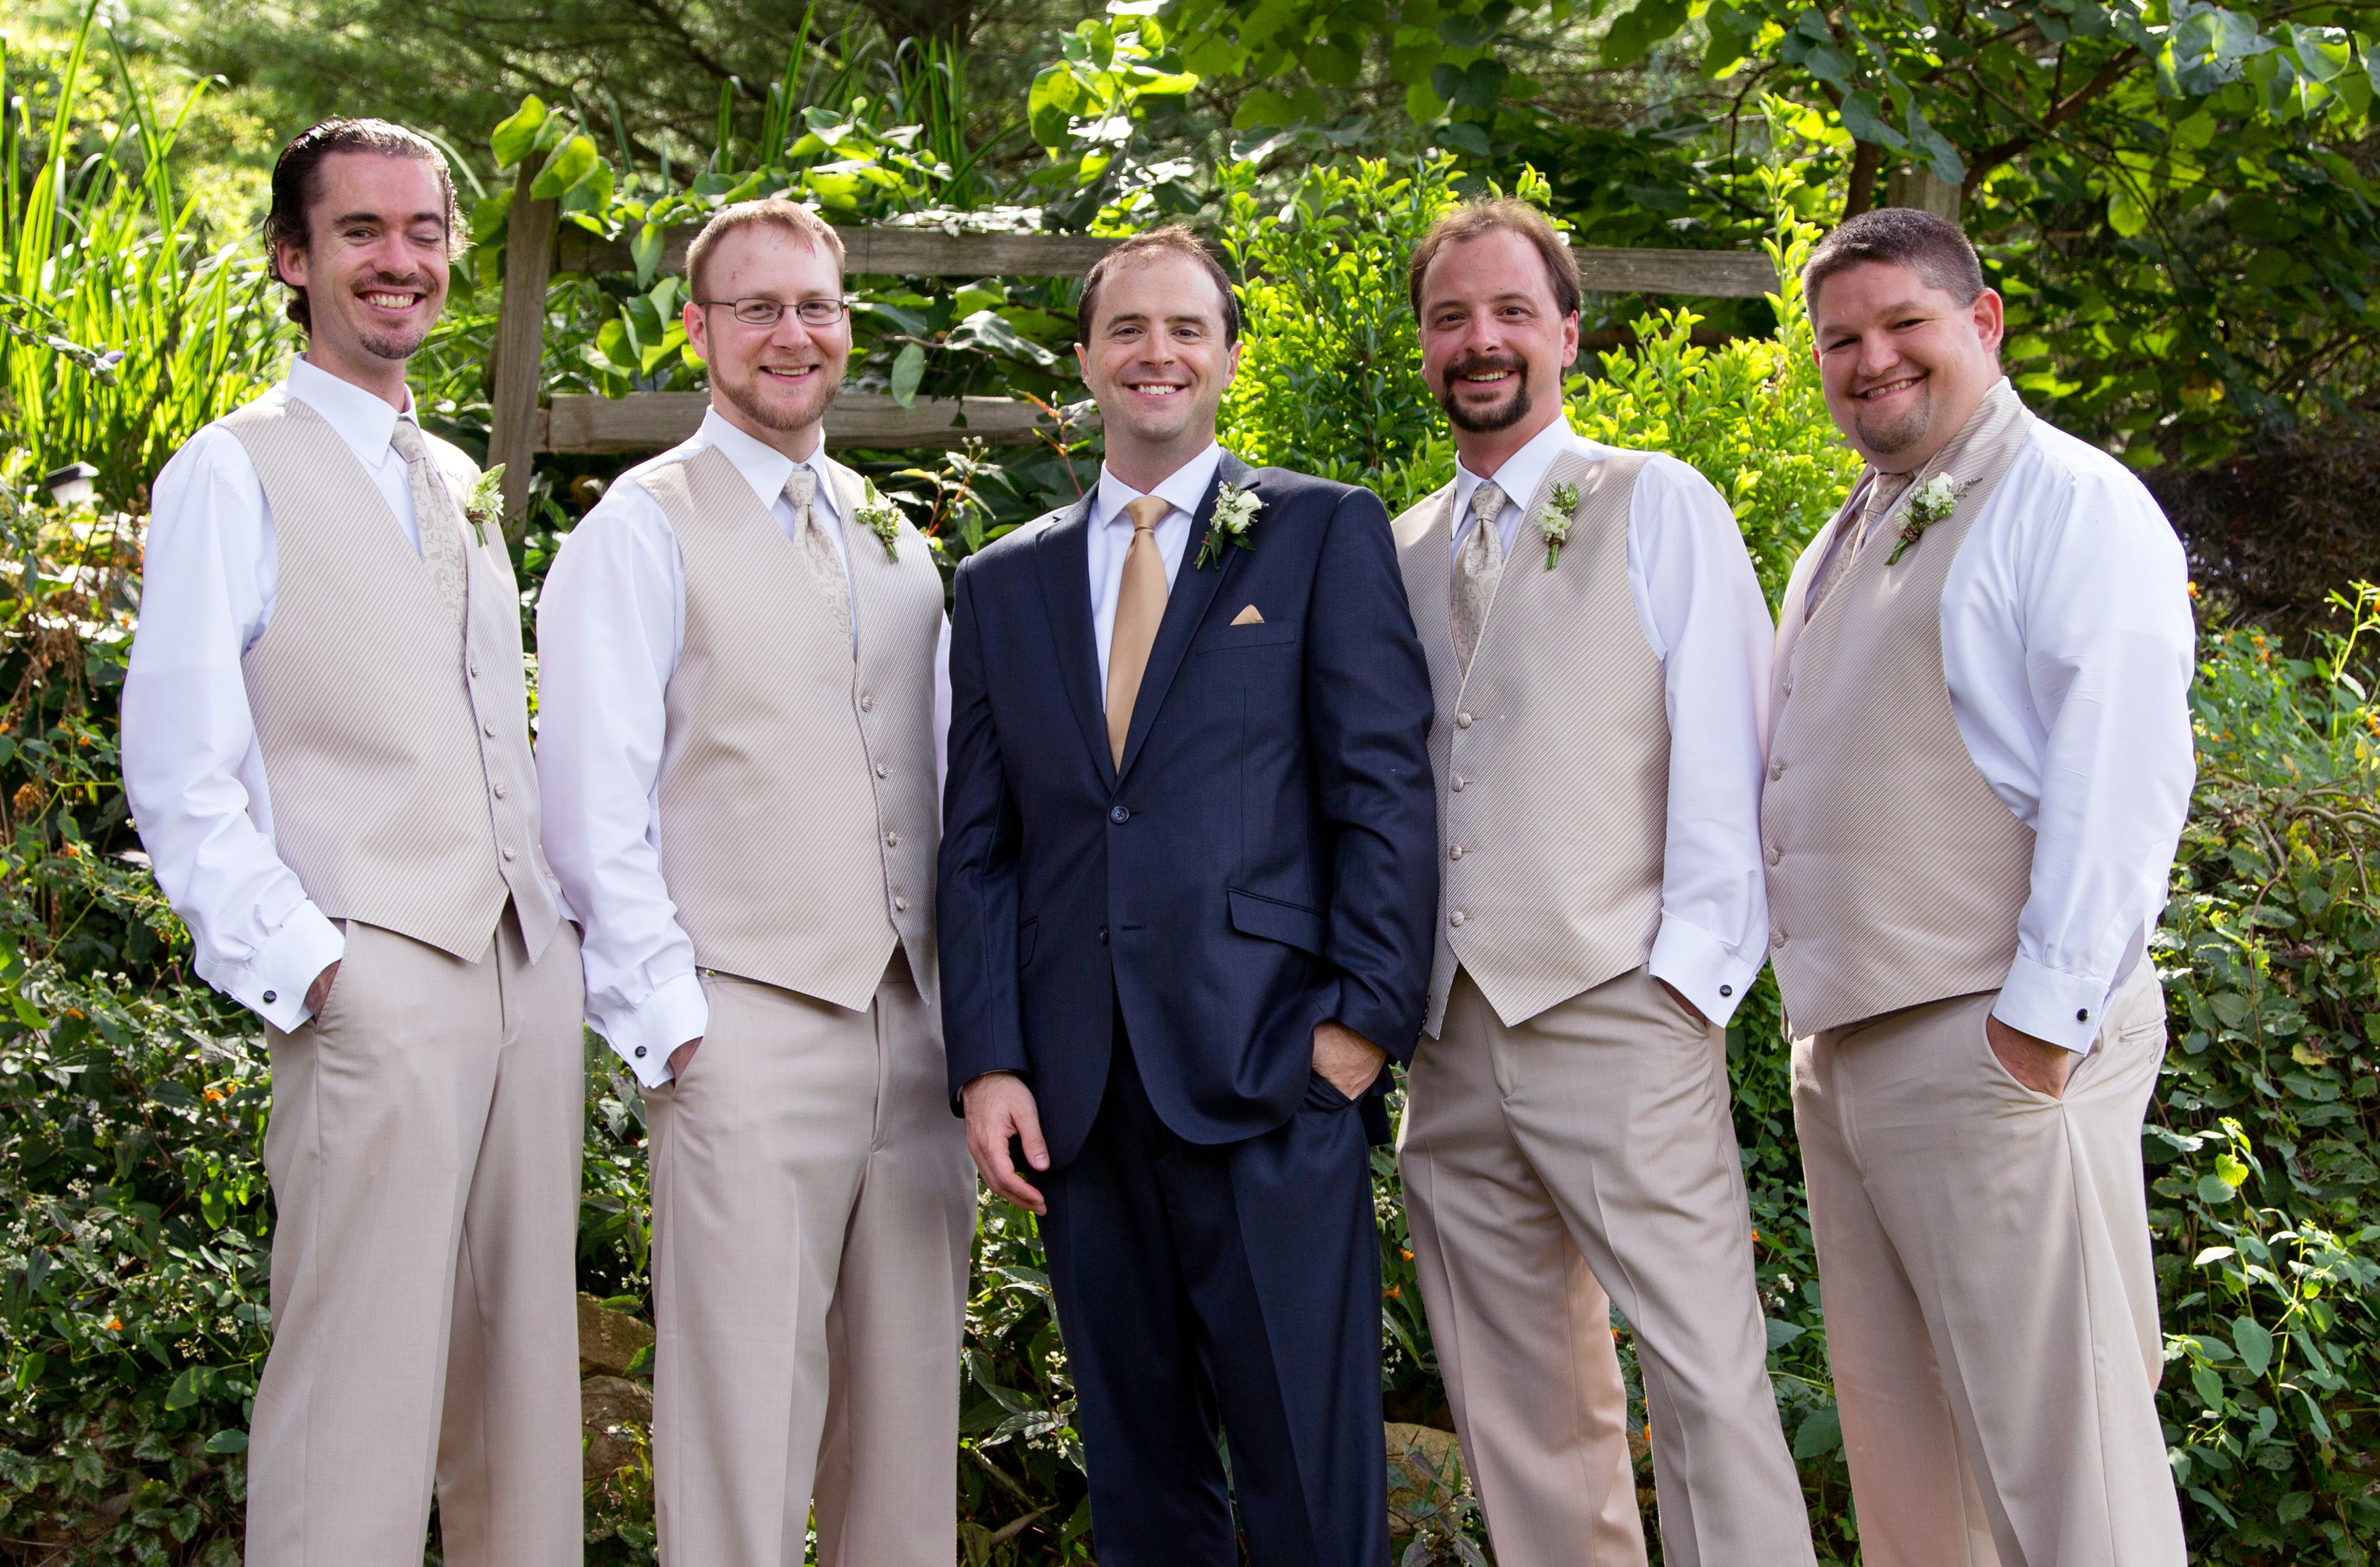 Groomsmen Groom In Navy Suit With Champagne Tie Groomsmen In Tan Vests Wedding Blue Suit Wedding Champagne Bridesmaid Dresses Groomsmen Attire